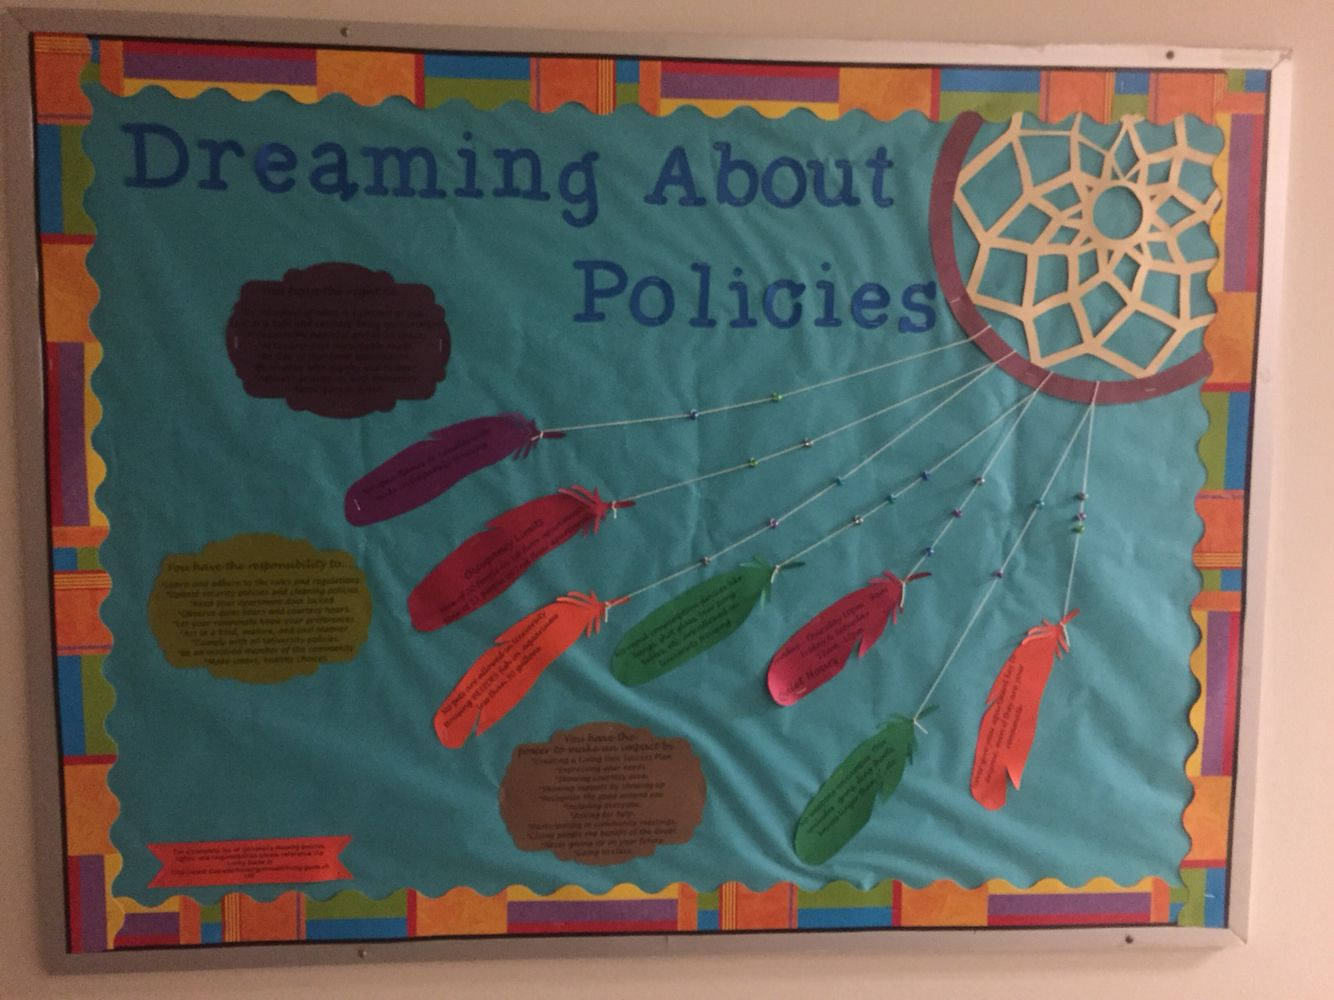 Dream Catcher Bulletin Board About Policies Goes Along With Dream Catcher Door Decs Ralife Dream Catcher Decor Creative Classroom Library Decor